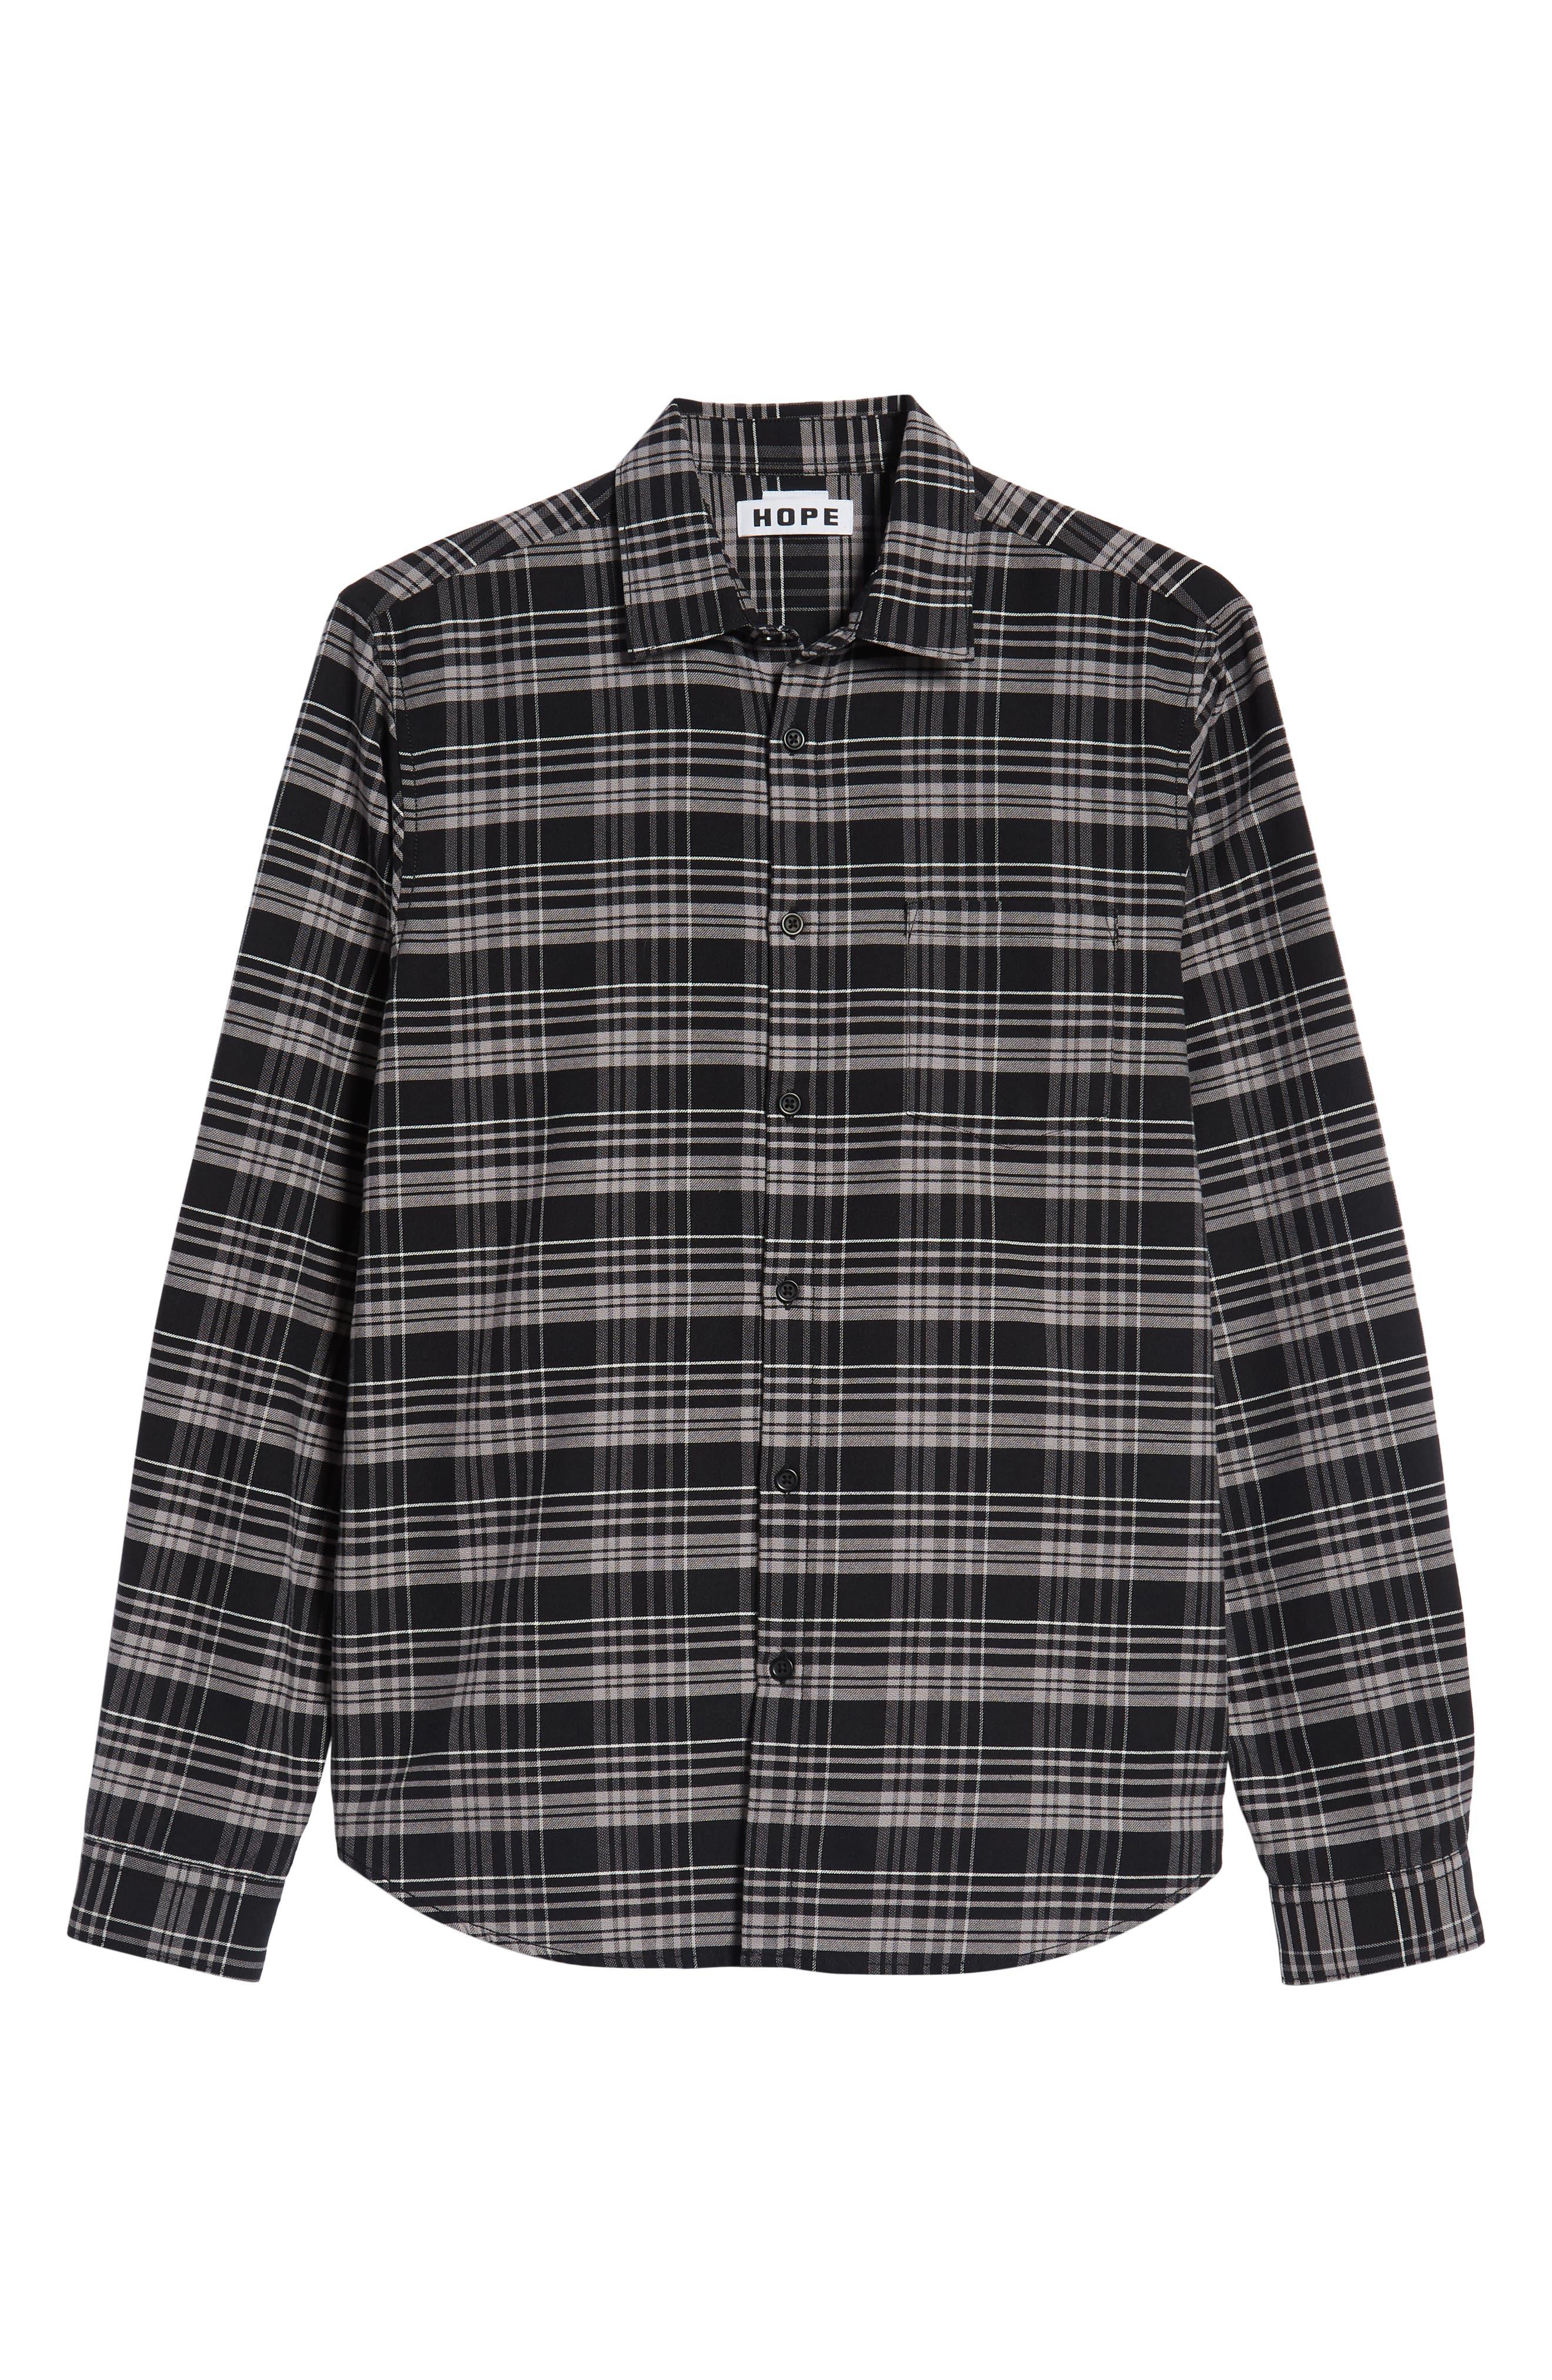 Roy Plaid Sport Shirt,                             Alternate thumbnail 5, color,                             BLACK CHECK